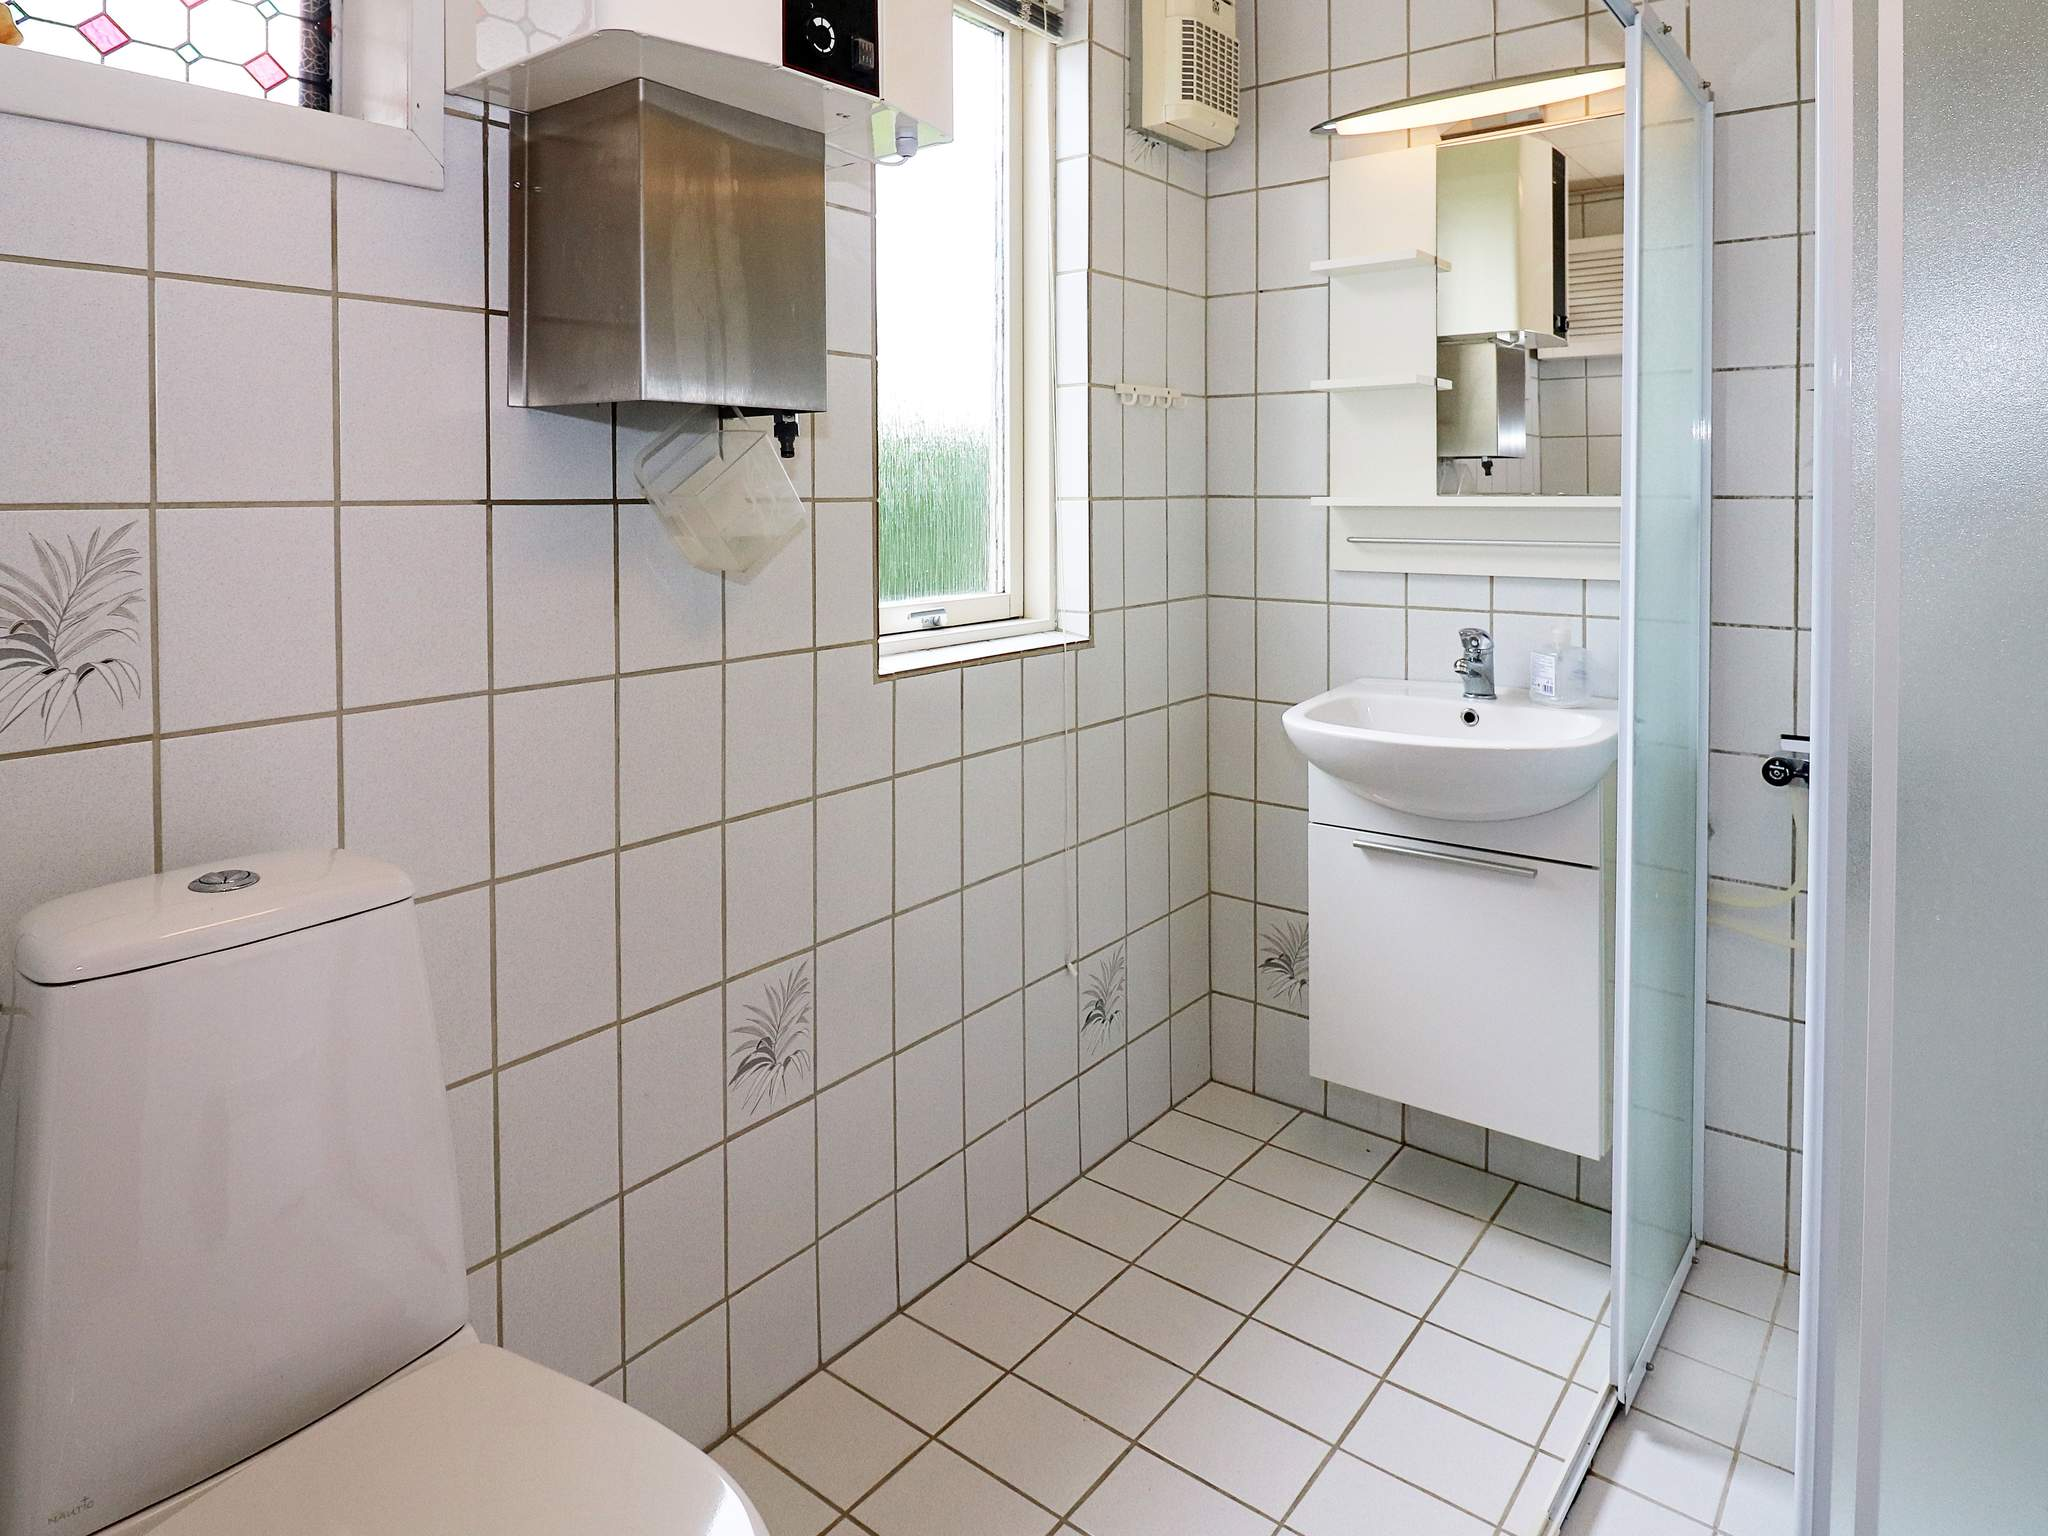 Ferienhaus Øster Hurup (727979), Øster Hurup, , Ostjütland, Dänemark, Bild 10